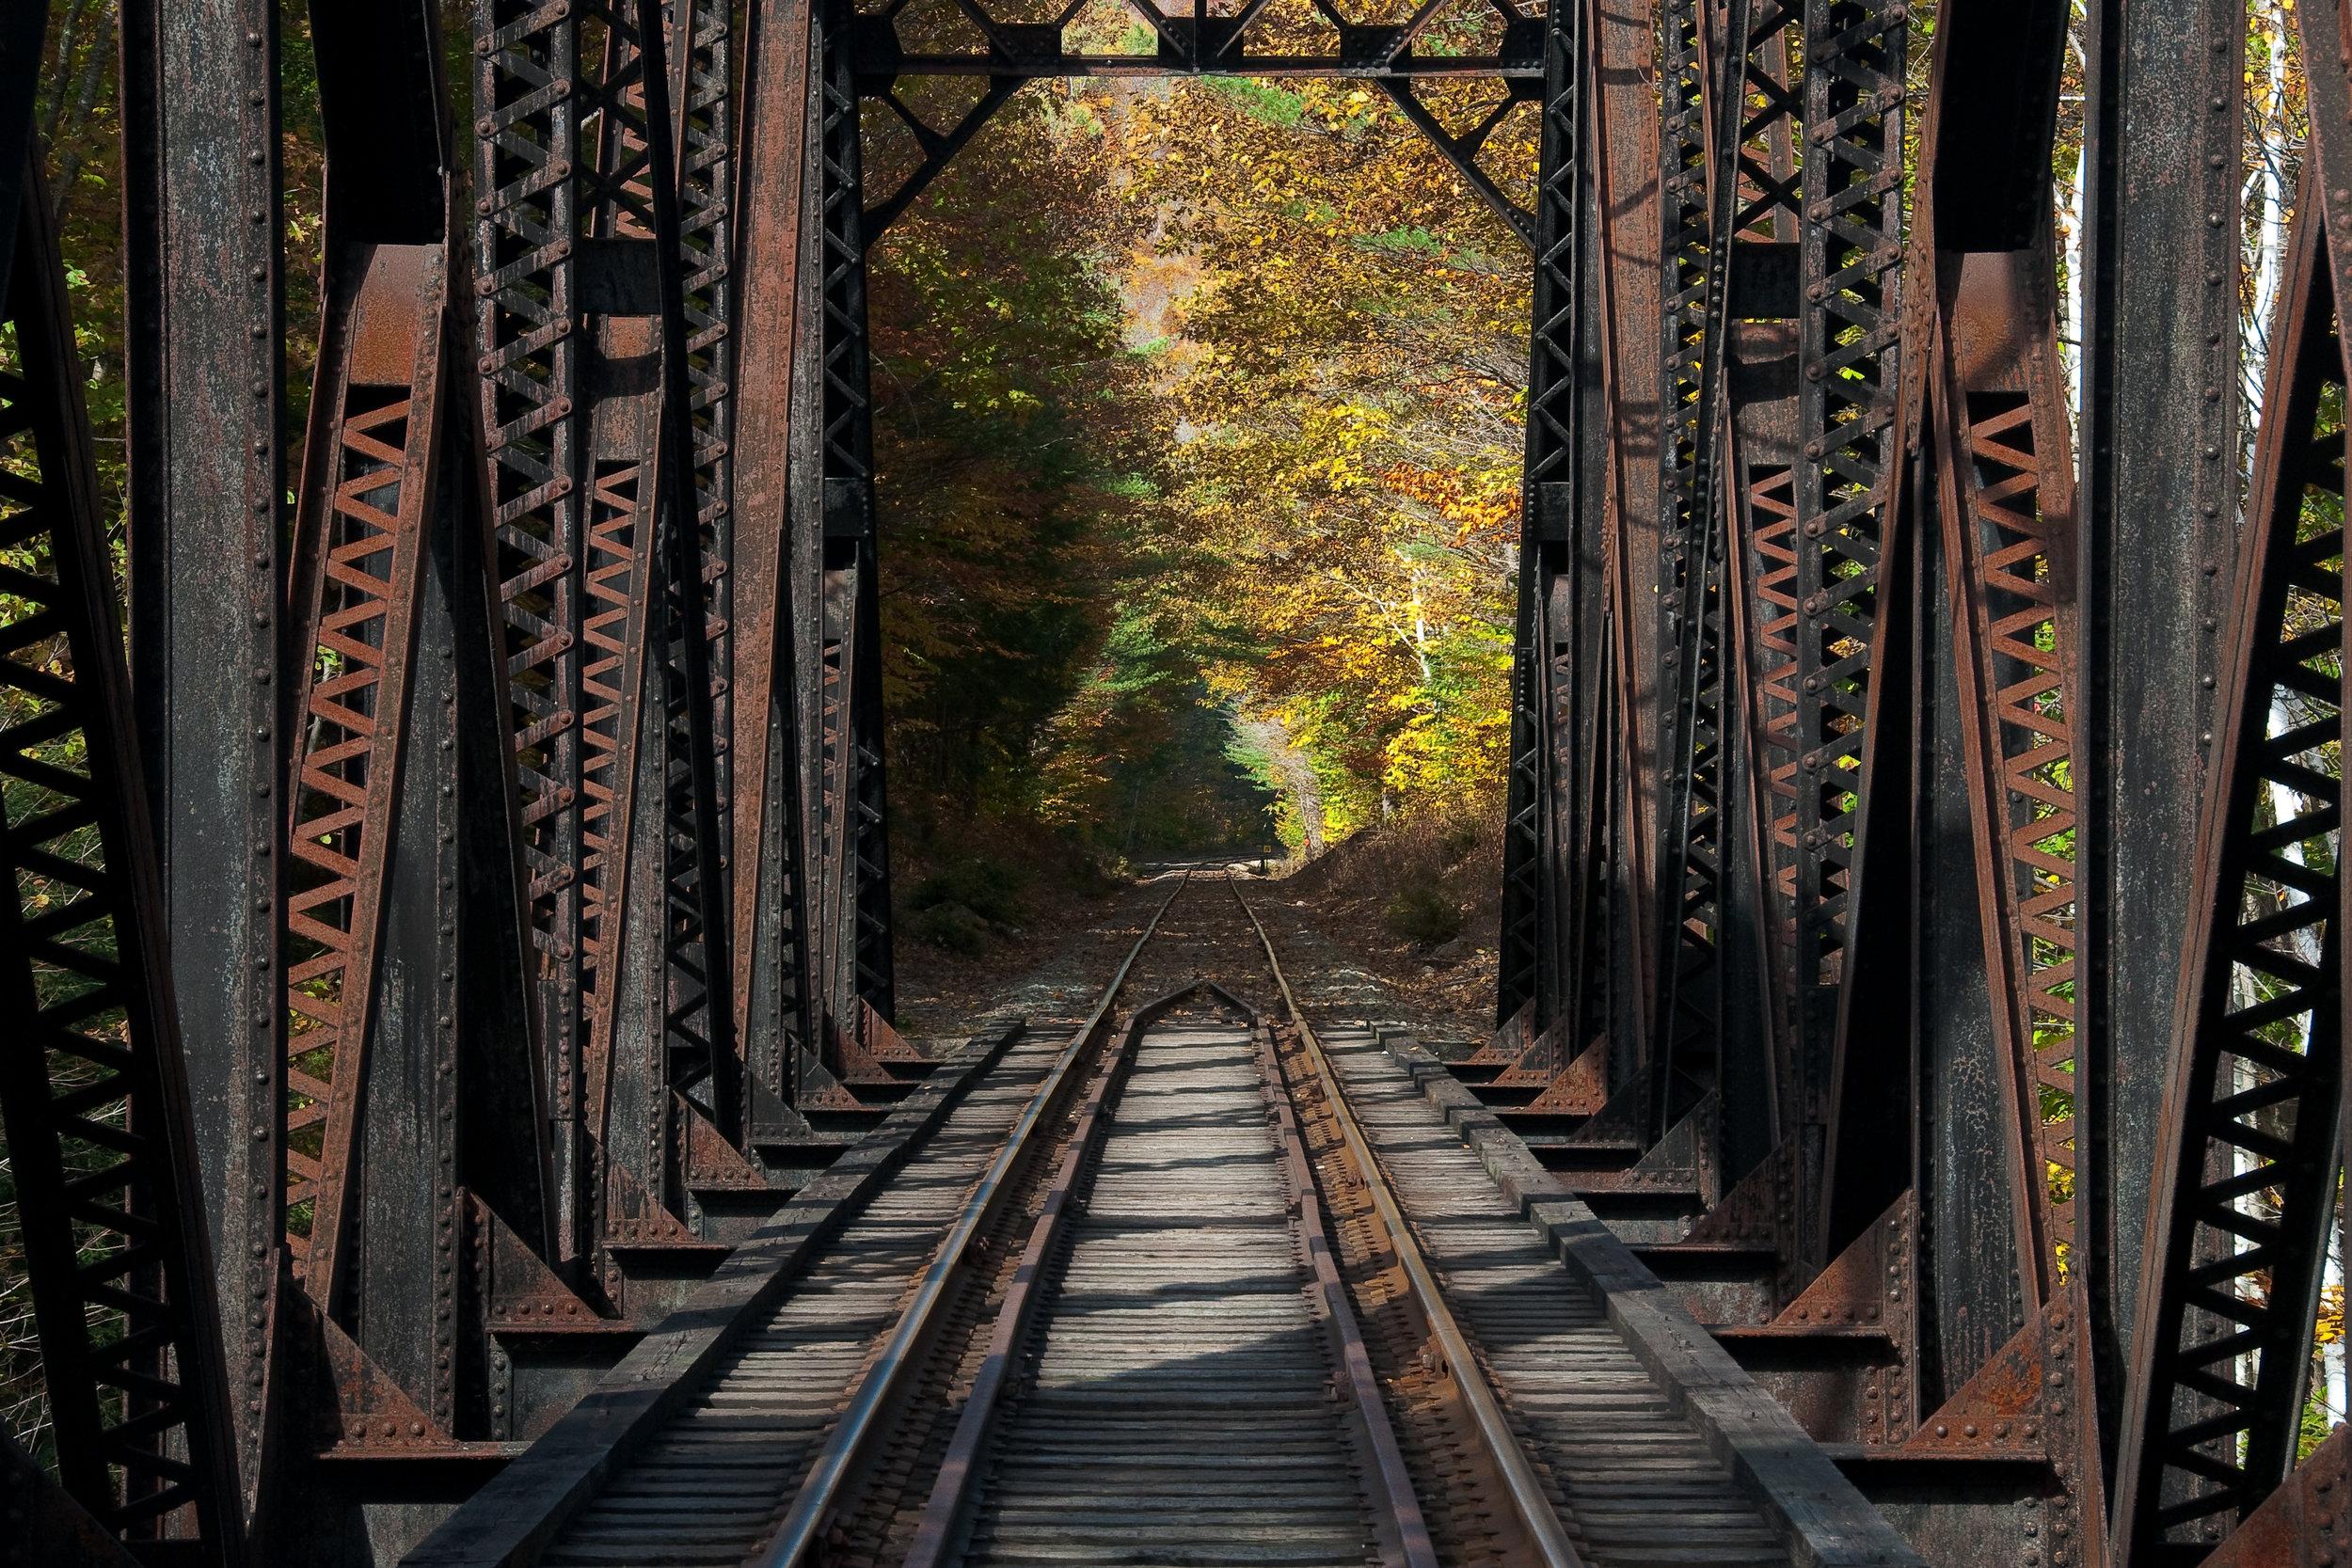 Bridging New Hampshire - 2009